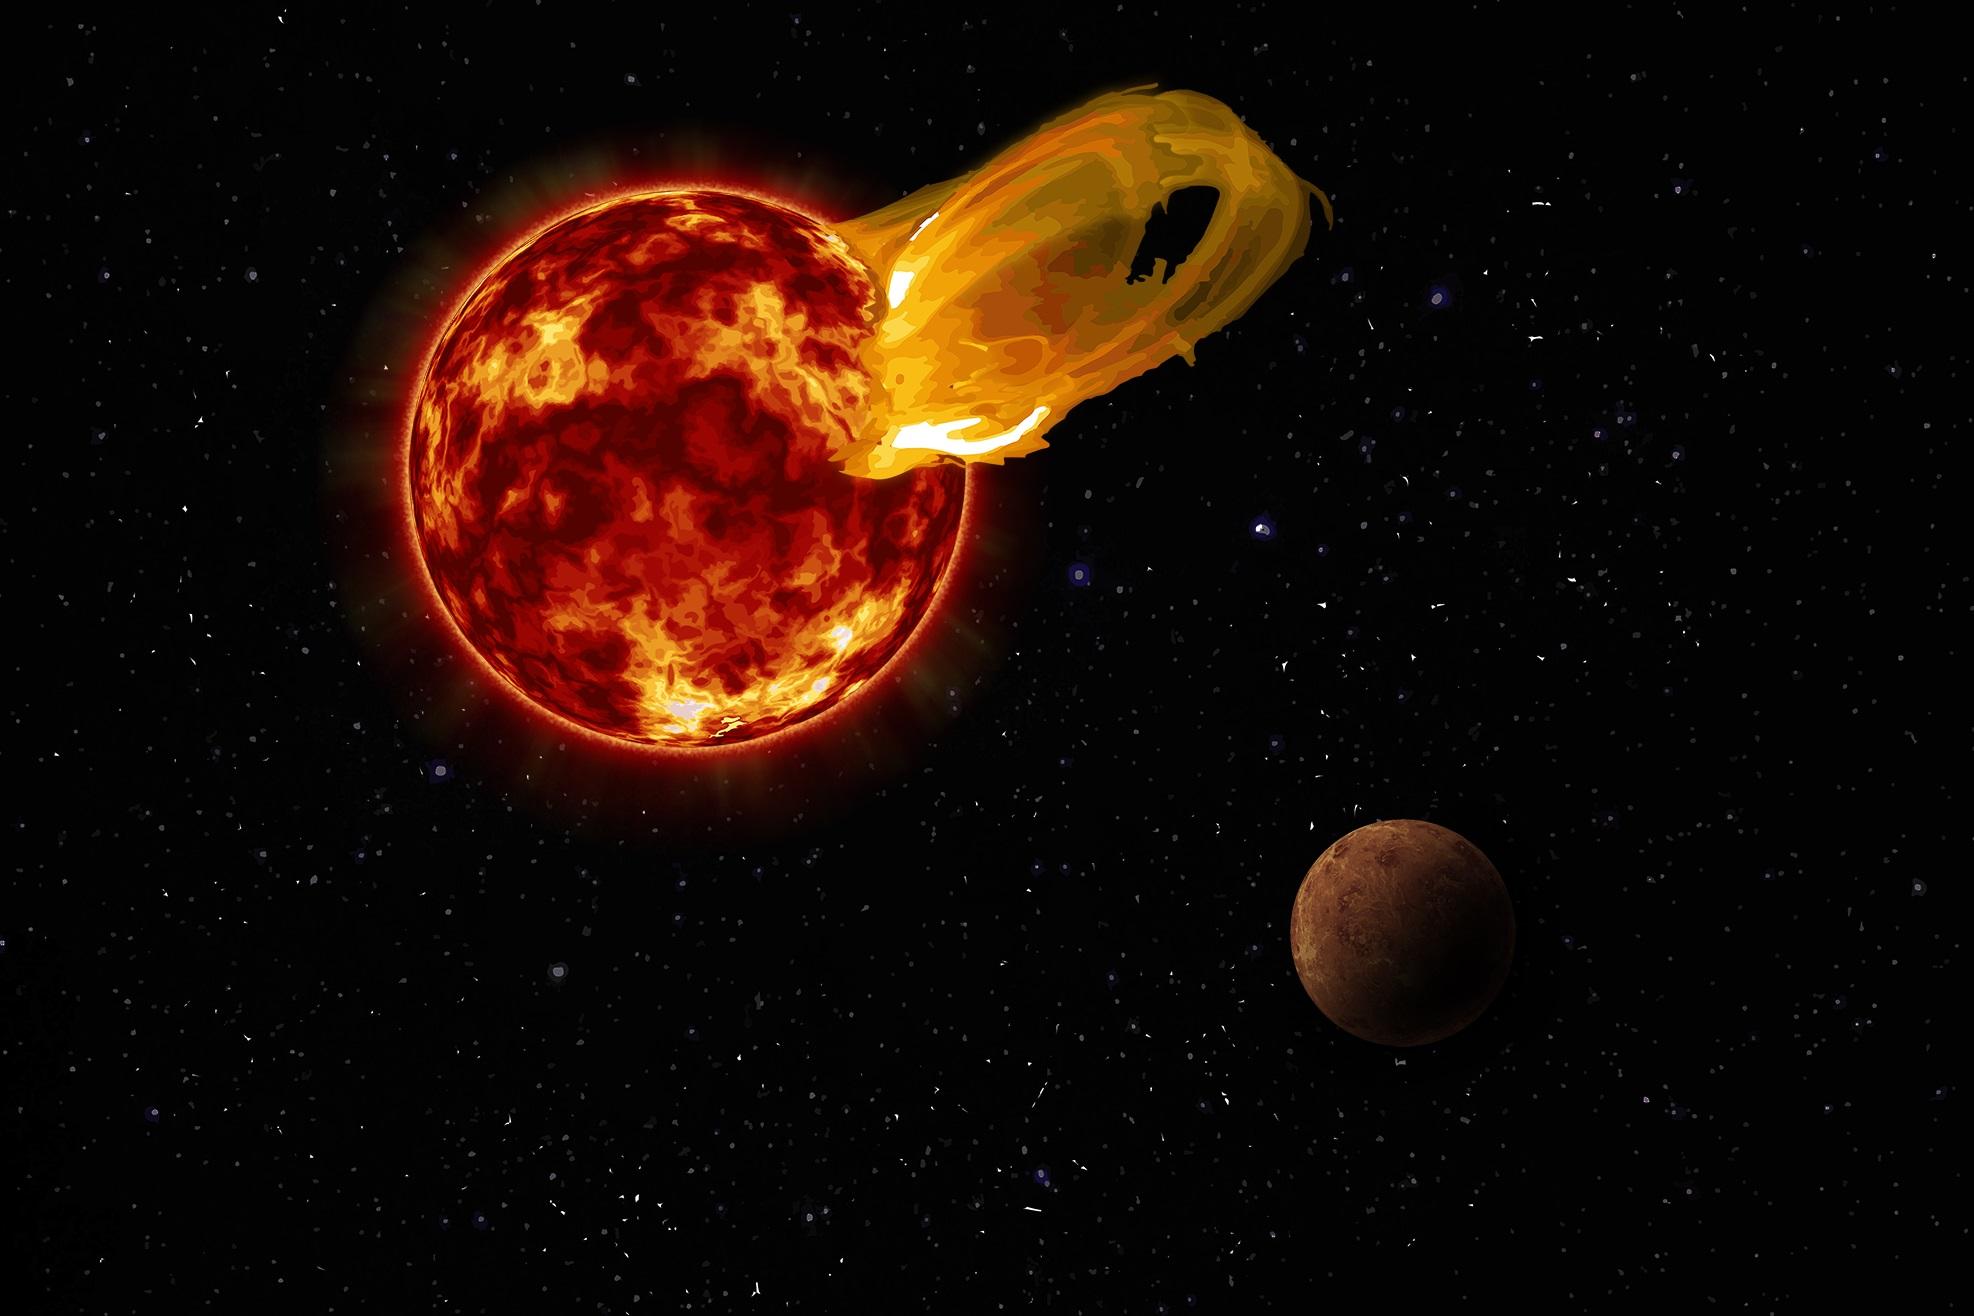 No dust ring required around Proxima Centauri